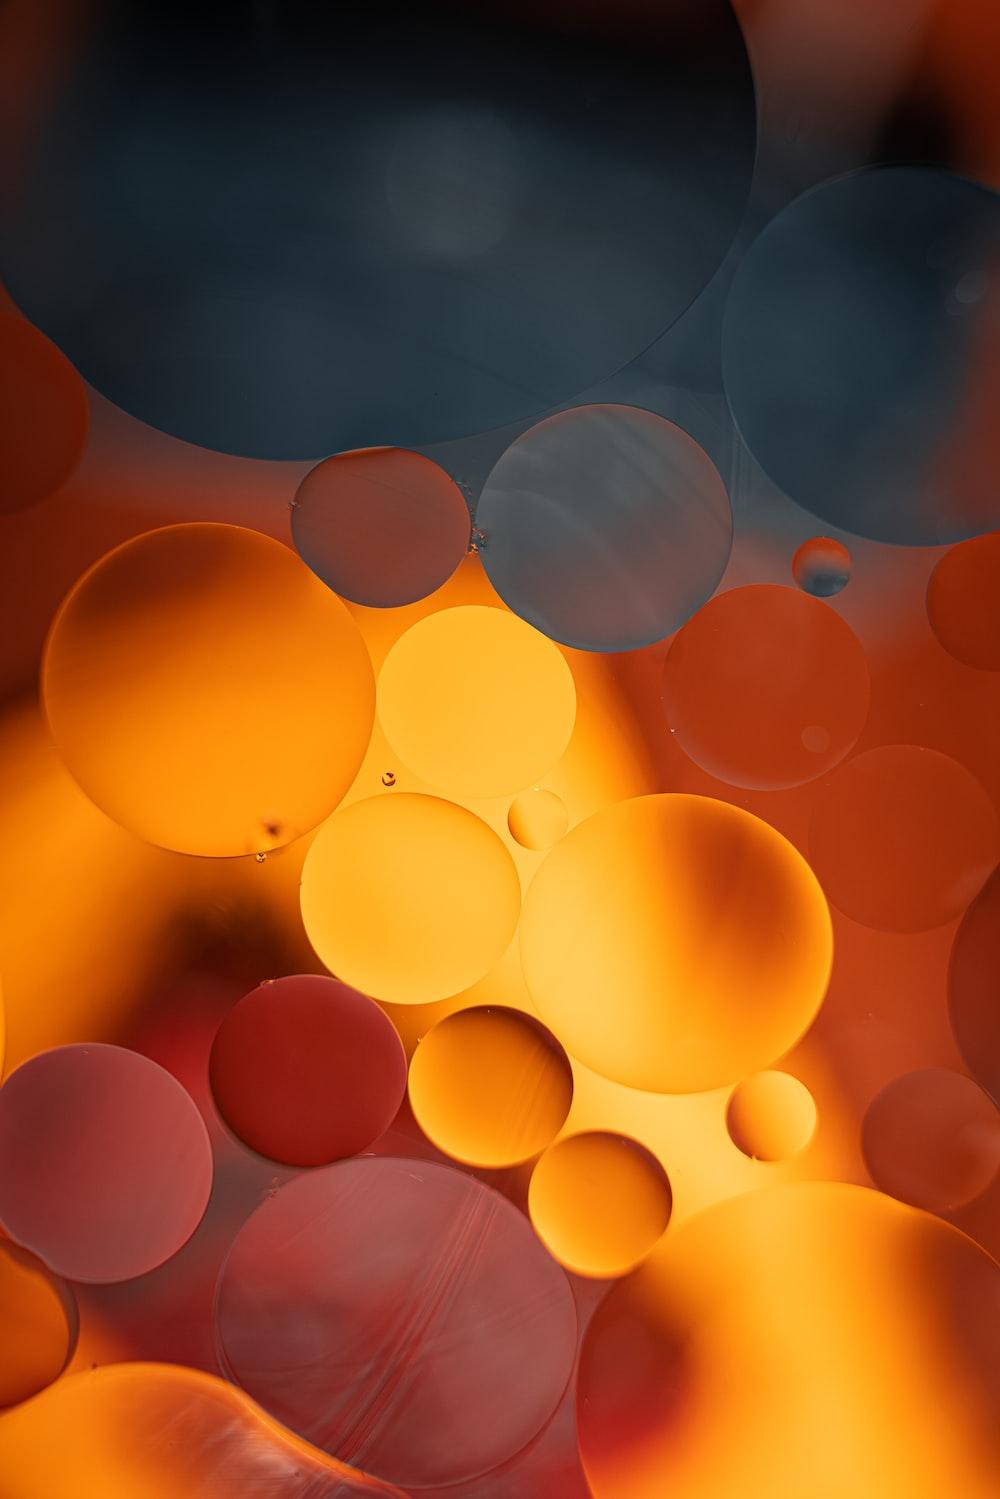 orange balloons in the sky